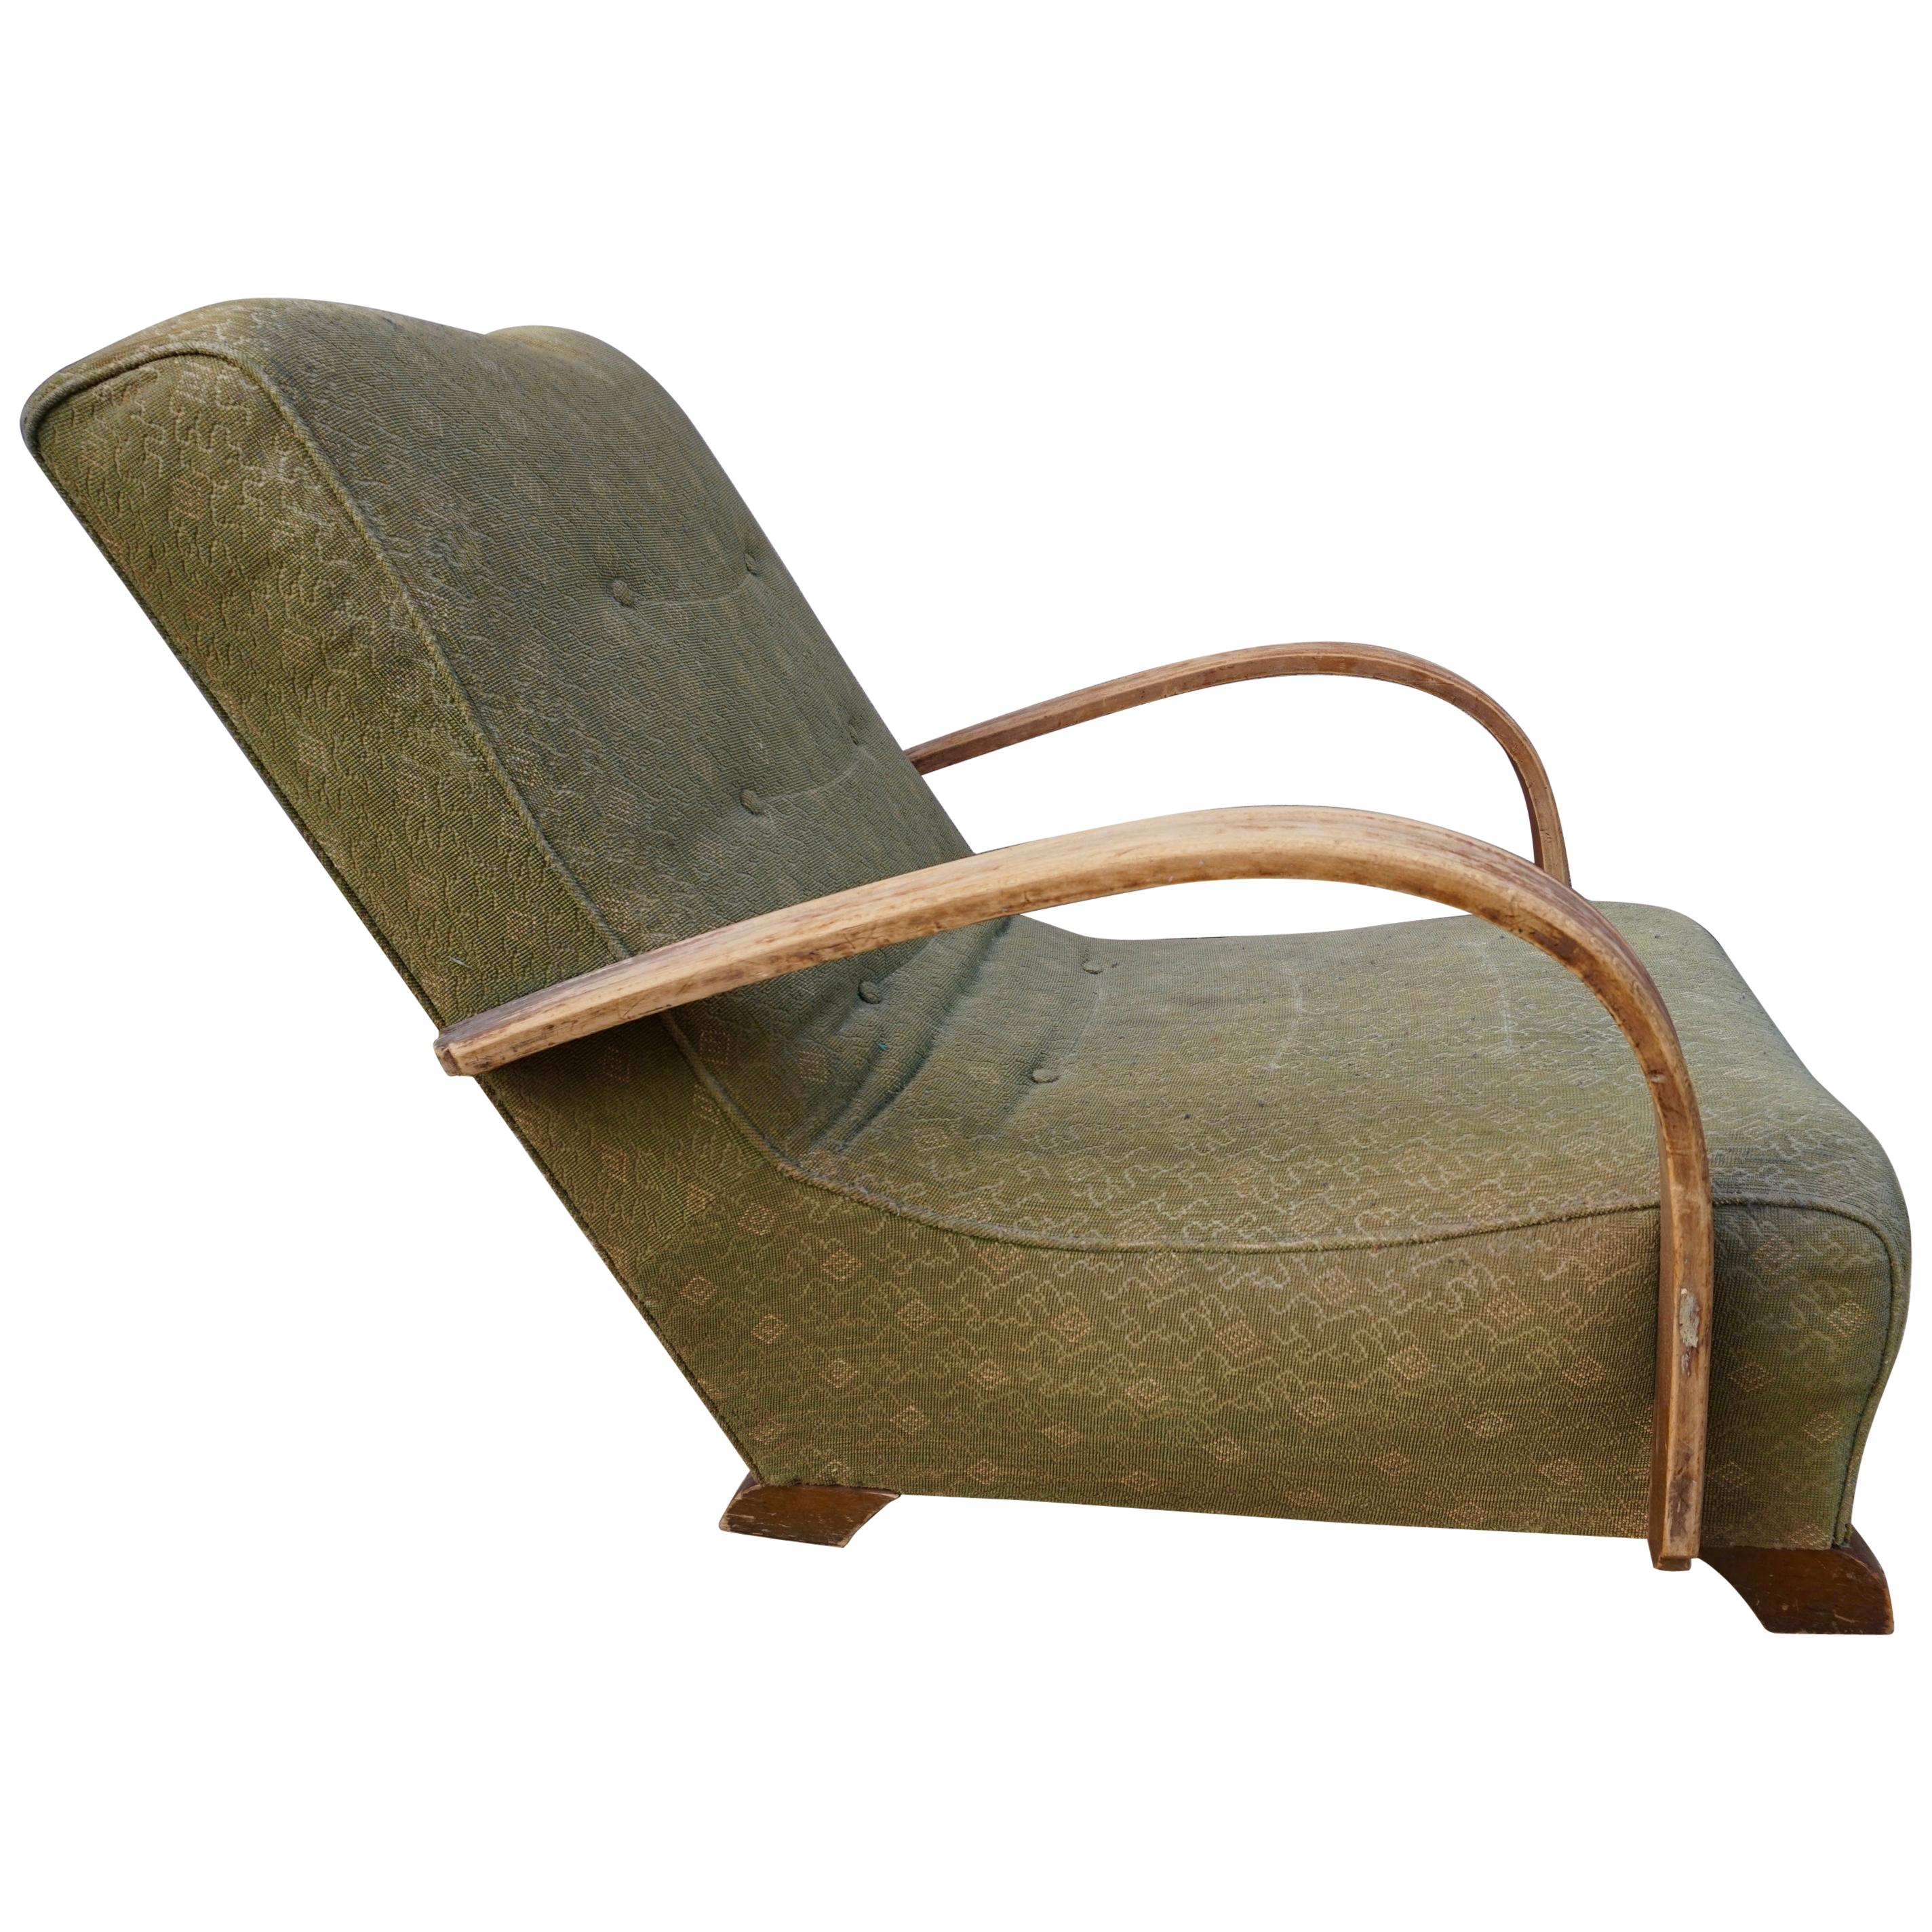 Genuine Art Deco Lounge Club Chair in Original Condition